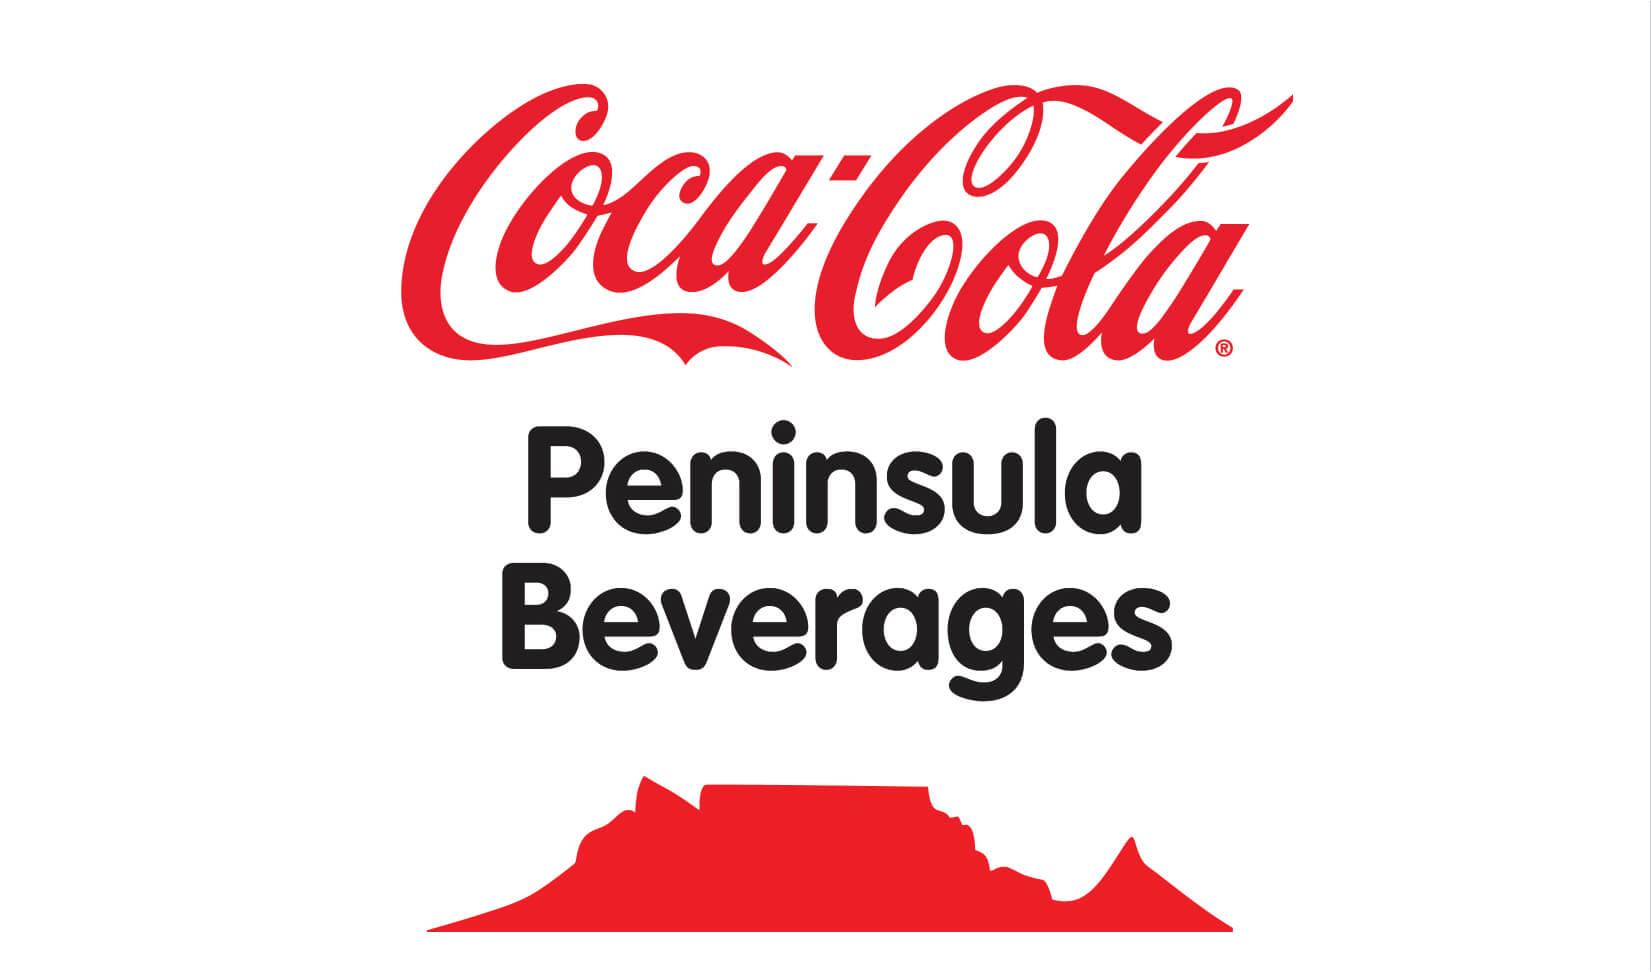 Peninsula Beverages